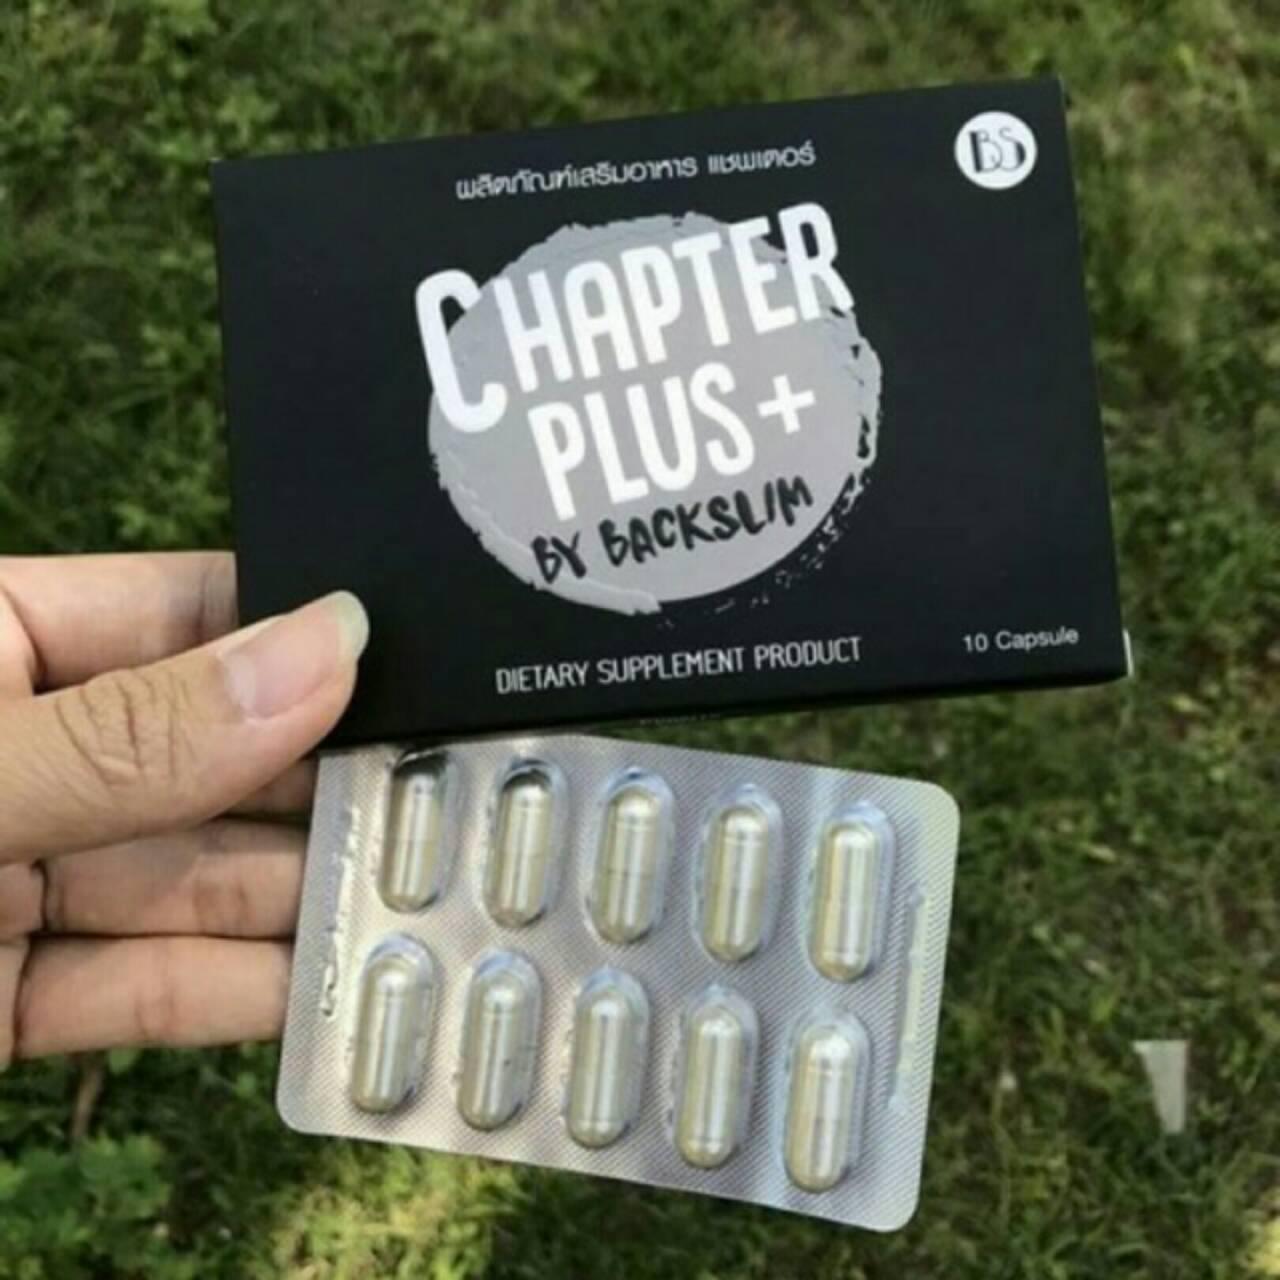 Chapter Plus (แชพเตอร์ พลัส) by. BackSlim รุ่นใหม่ล่าสุด สำหรับคนดื้อยามากๆ